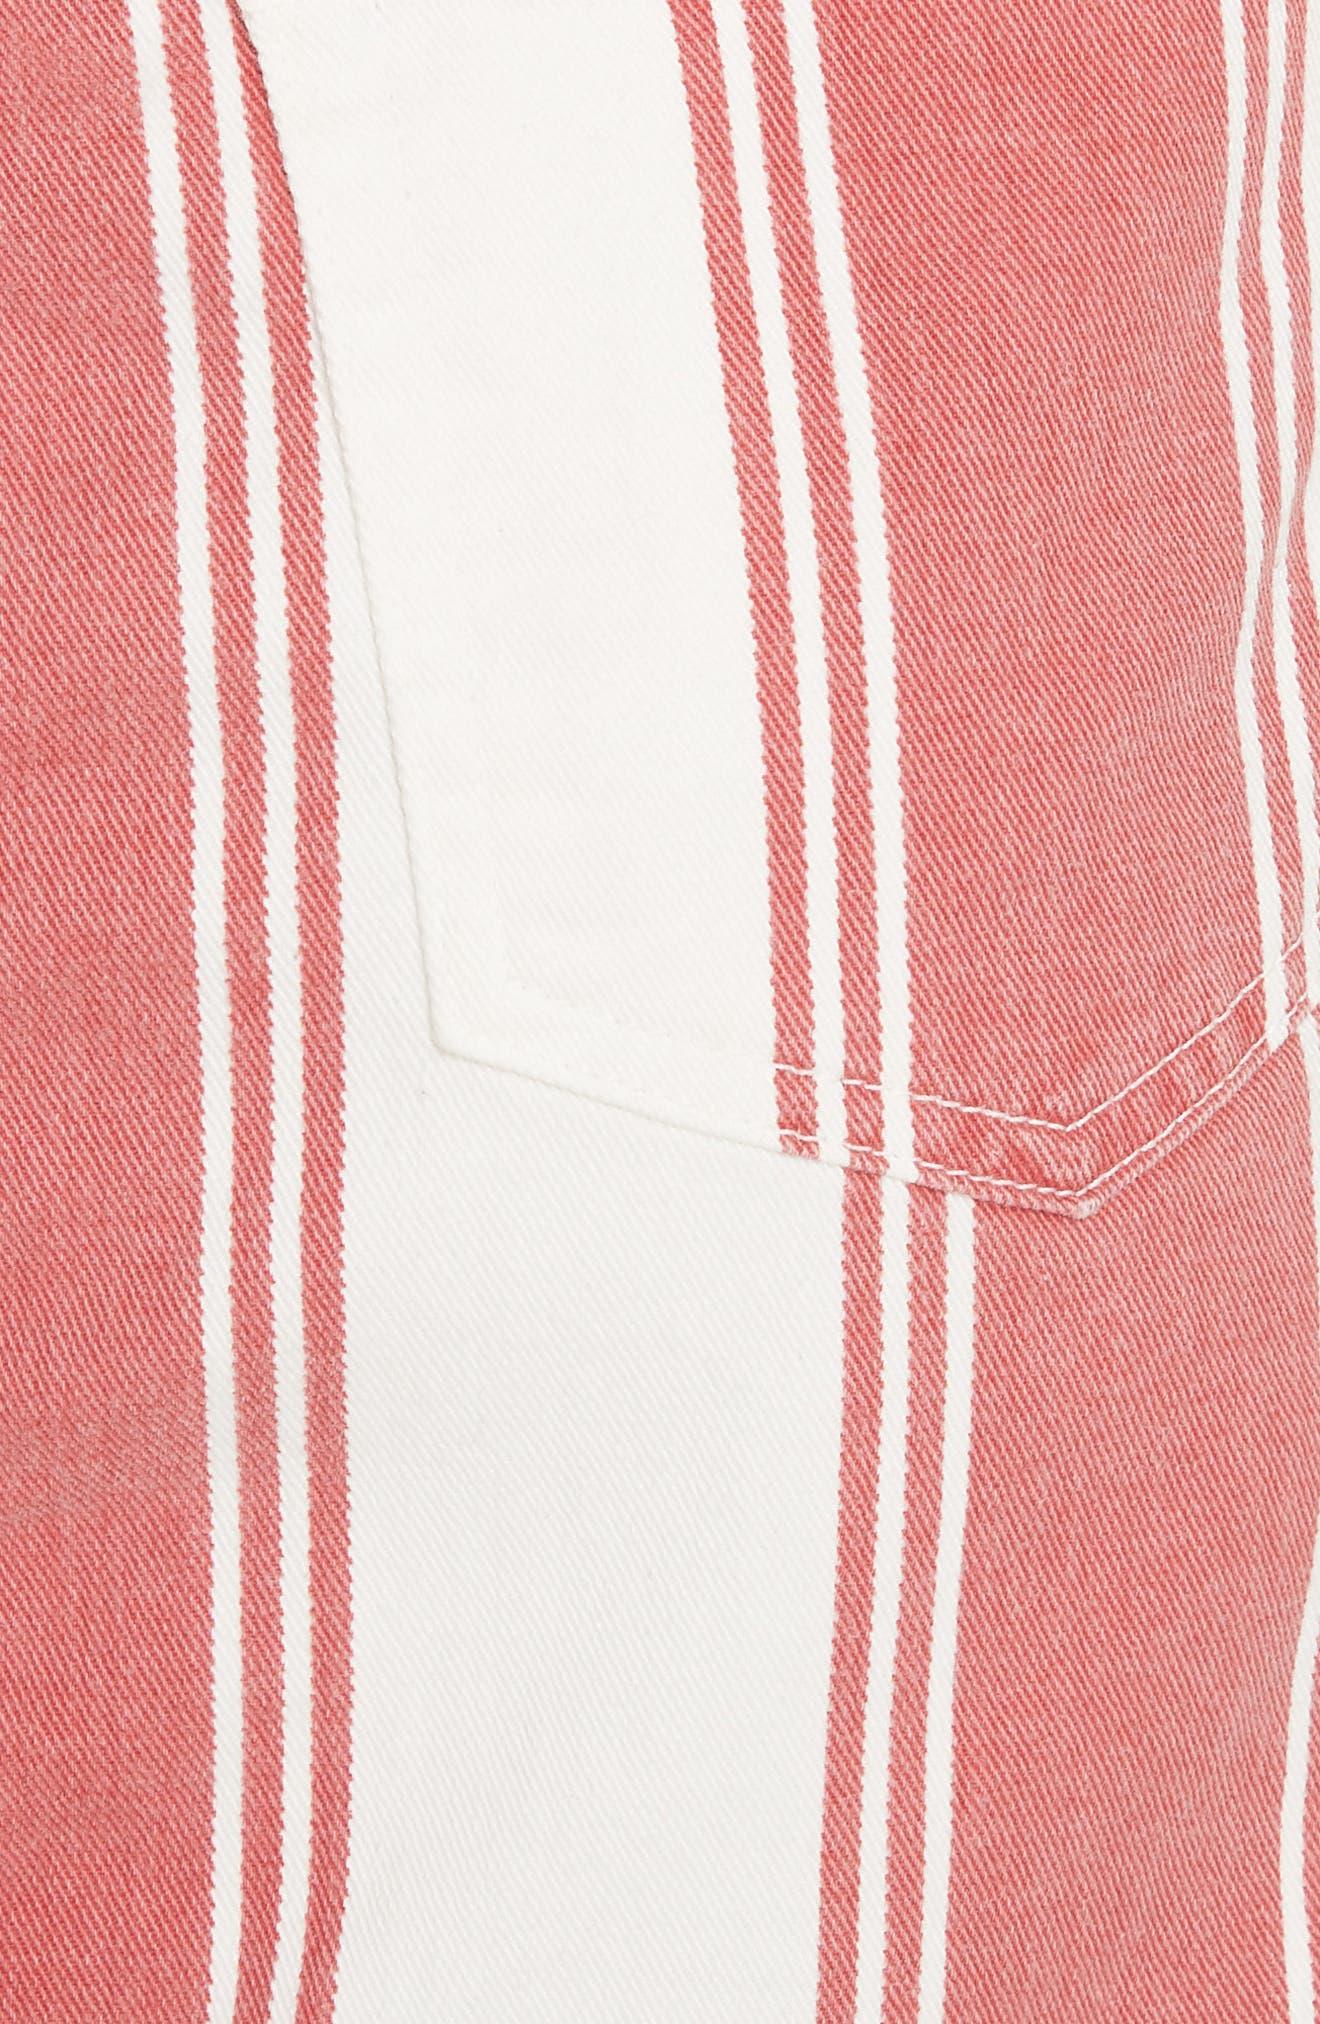 Le Mini Stripe Denim Skirt,                             Alternate thumbnail 3, color,                             Fiery Stripe